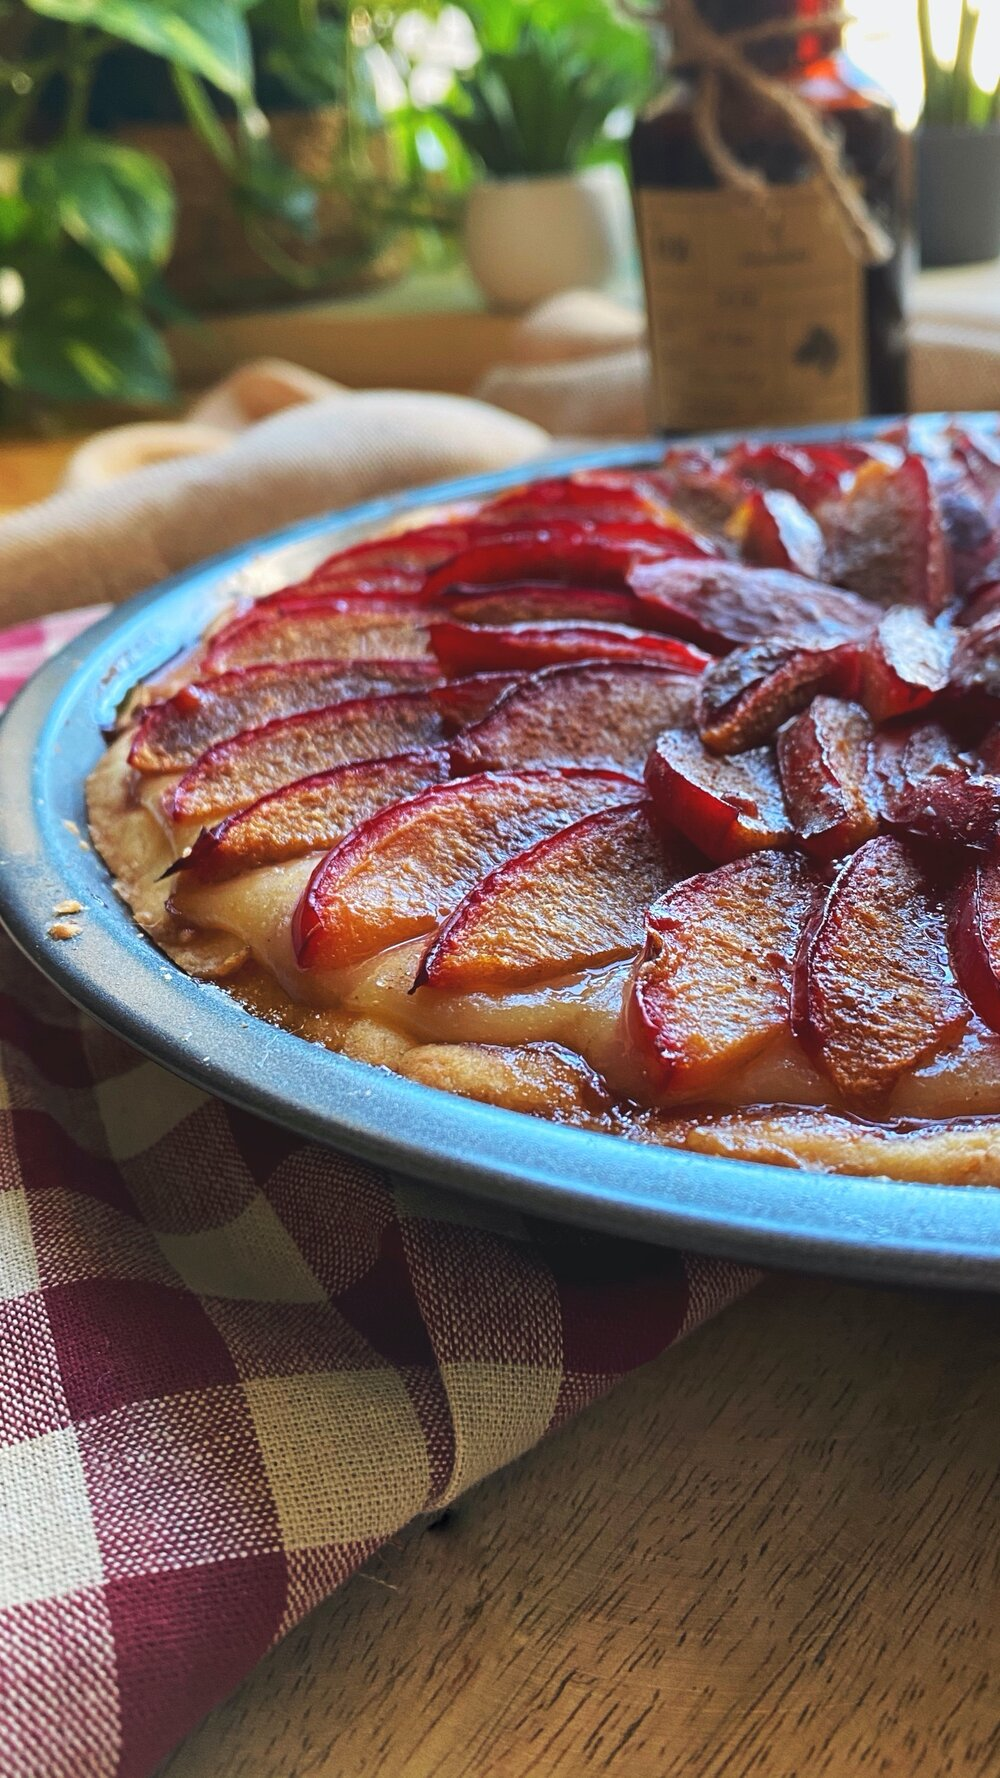 Vegan fruit tart with pastry cream recipe   How to make vegan pastry cream and a delicious vegan plum pie   Brownble